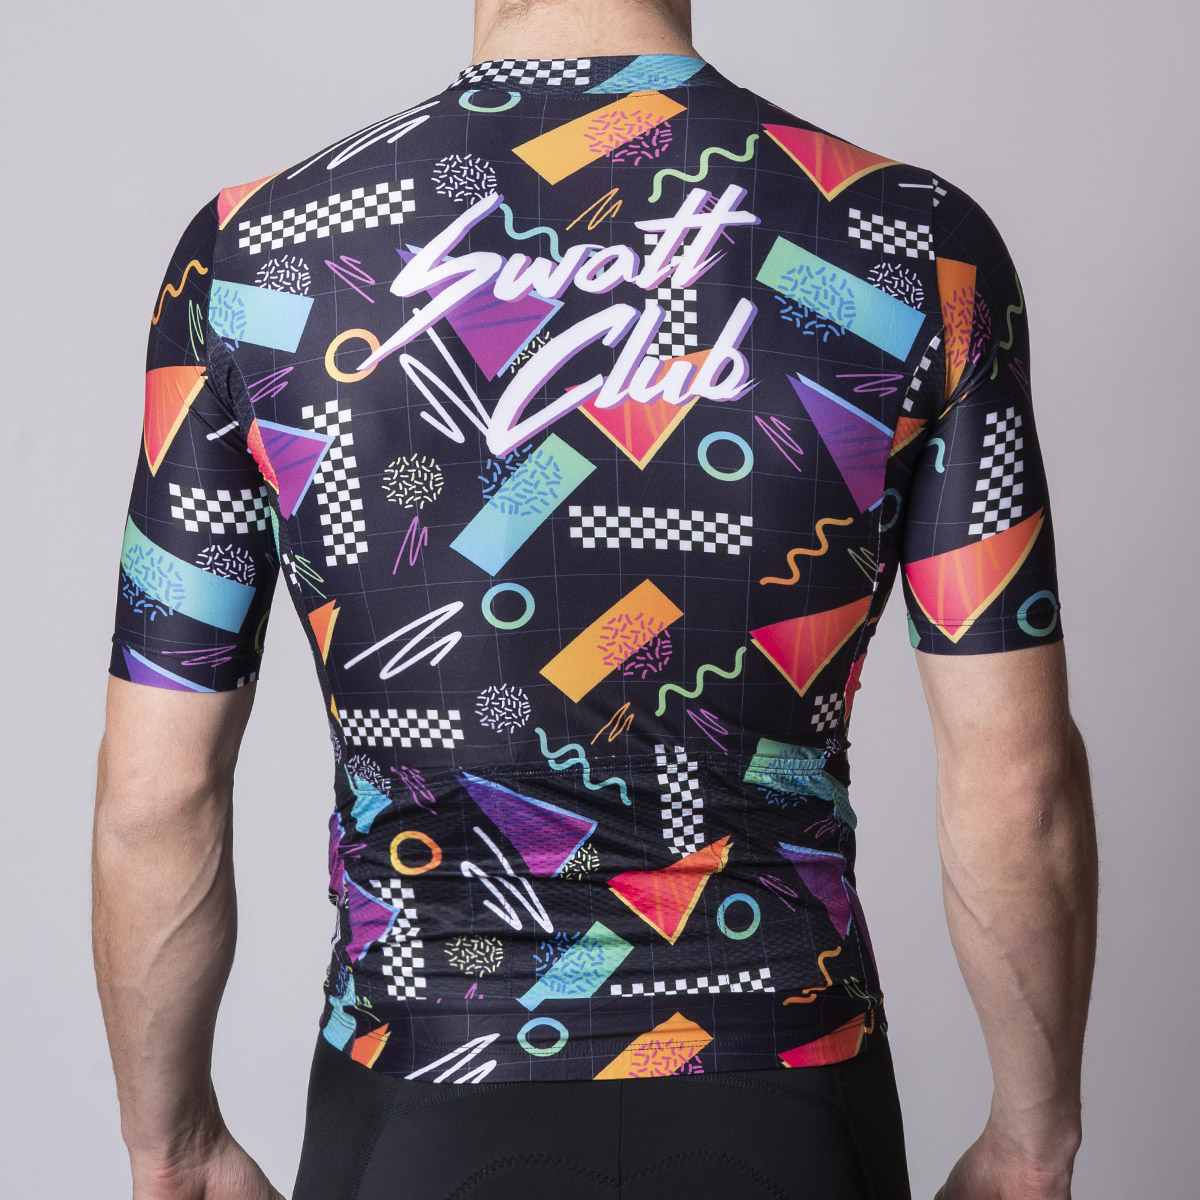 Ottanta cycling jersey swatt club maglia ciclismo